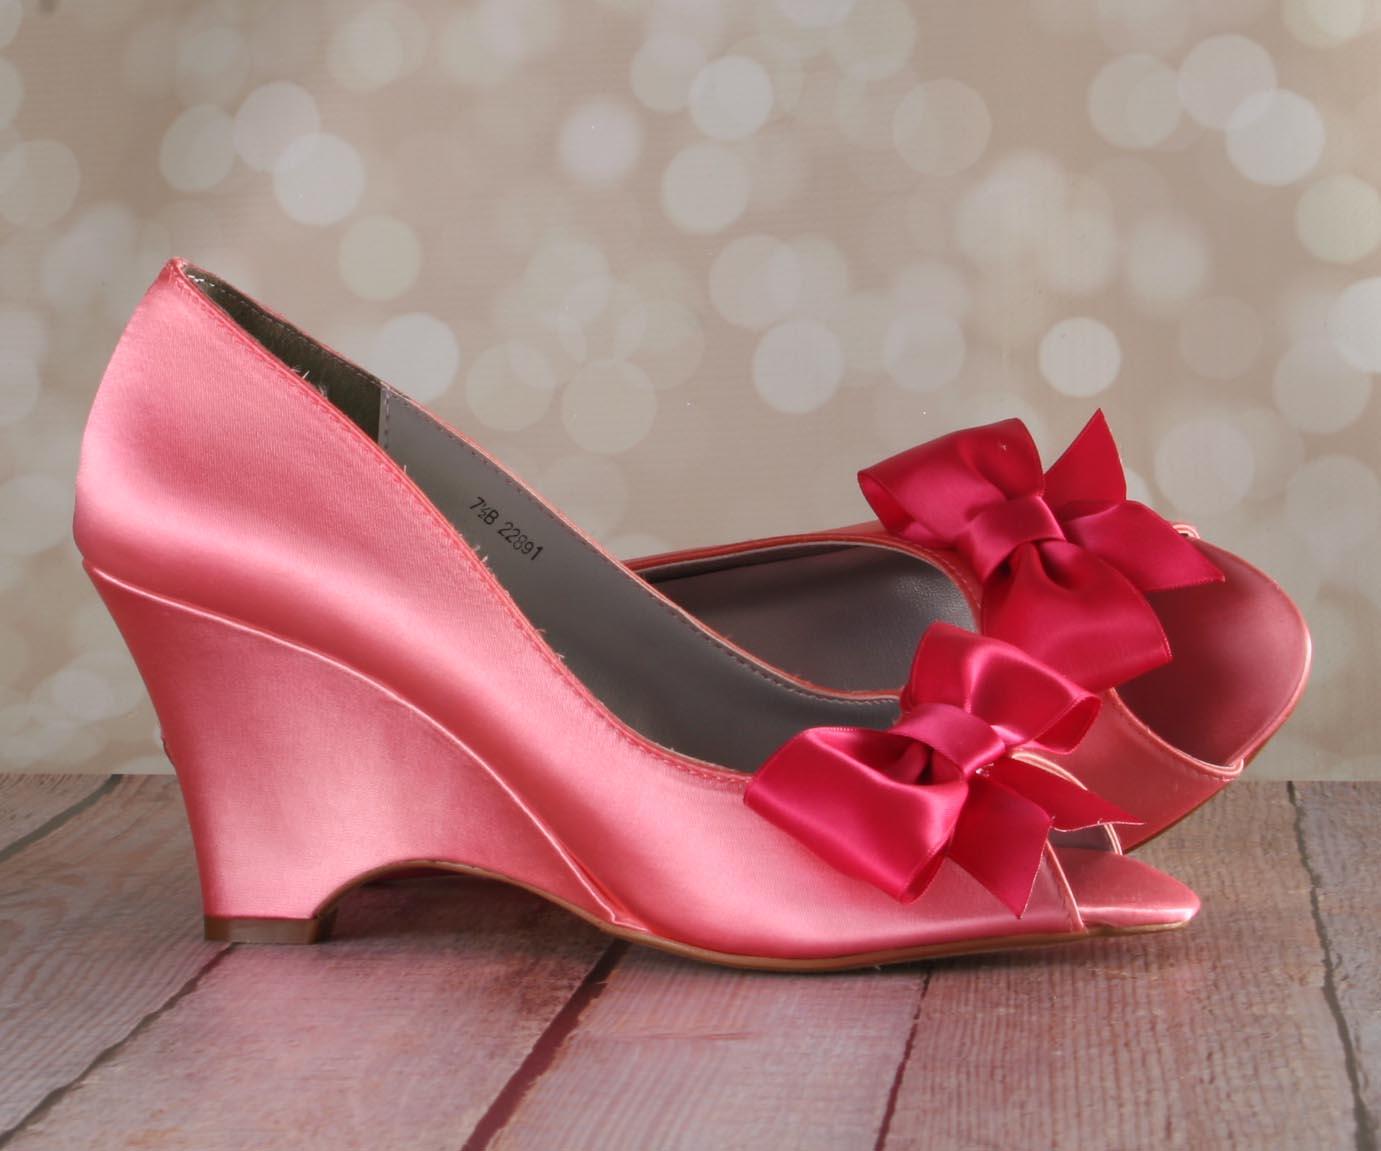 683ddcbafbab Coral Peeptoe Wedge Wedding Shoes with Fuschia Off Center Bow by Ellie Wren  Custom Wedding Shoes